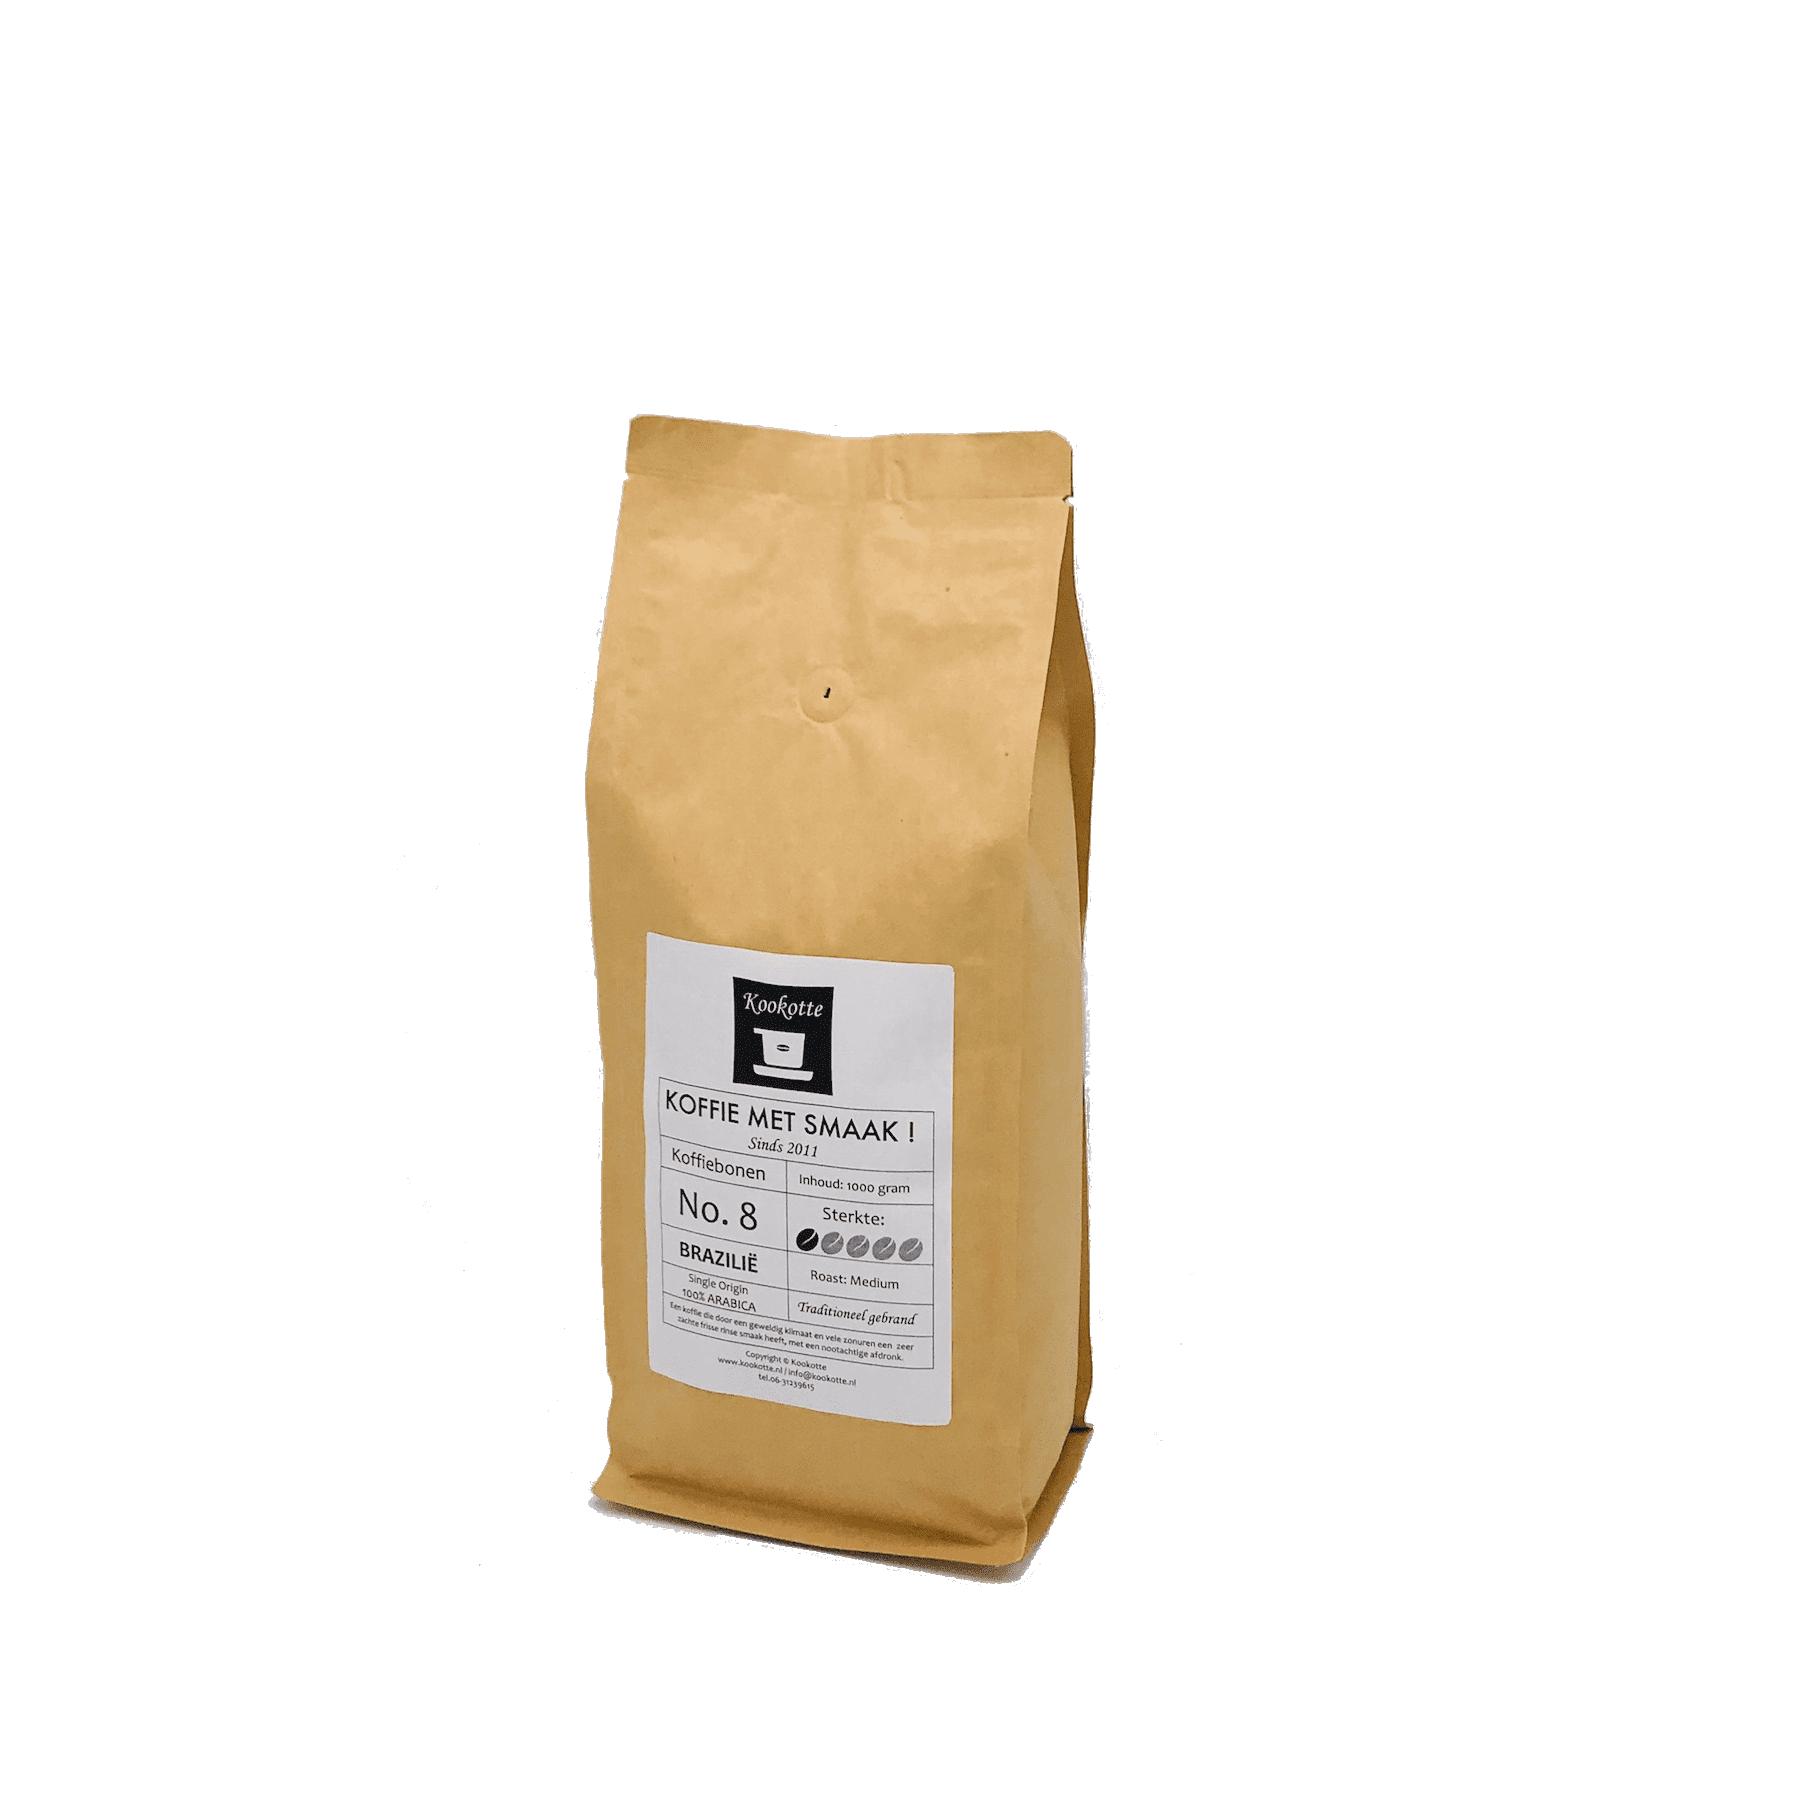 Koffiebonen No.8